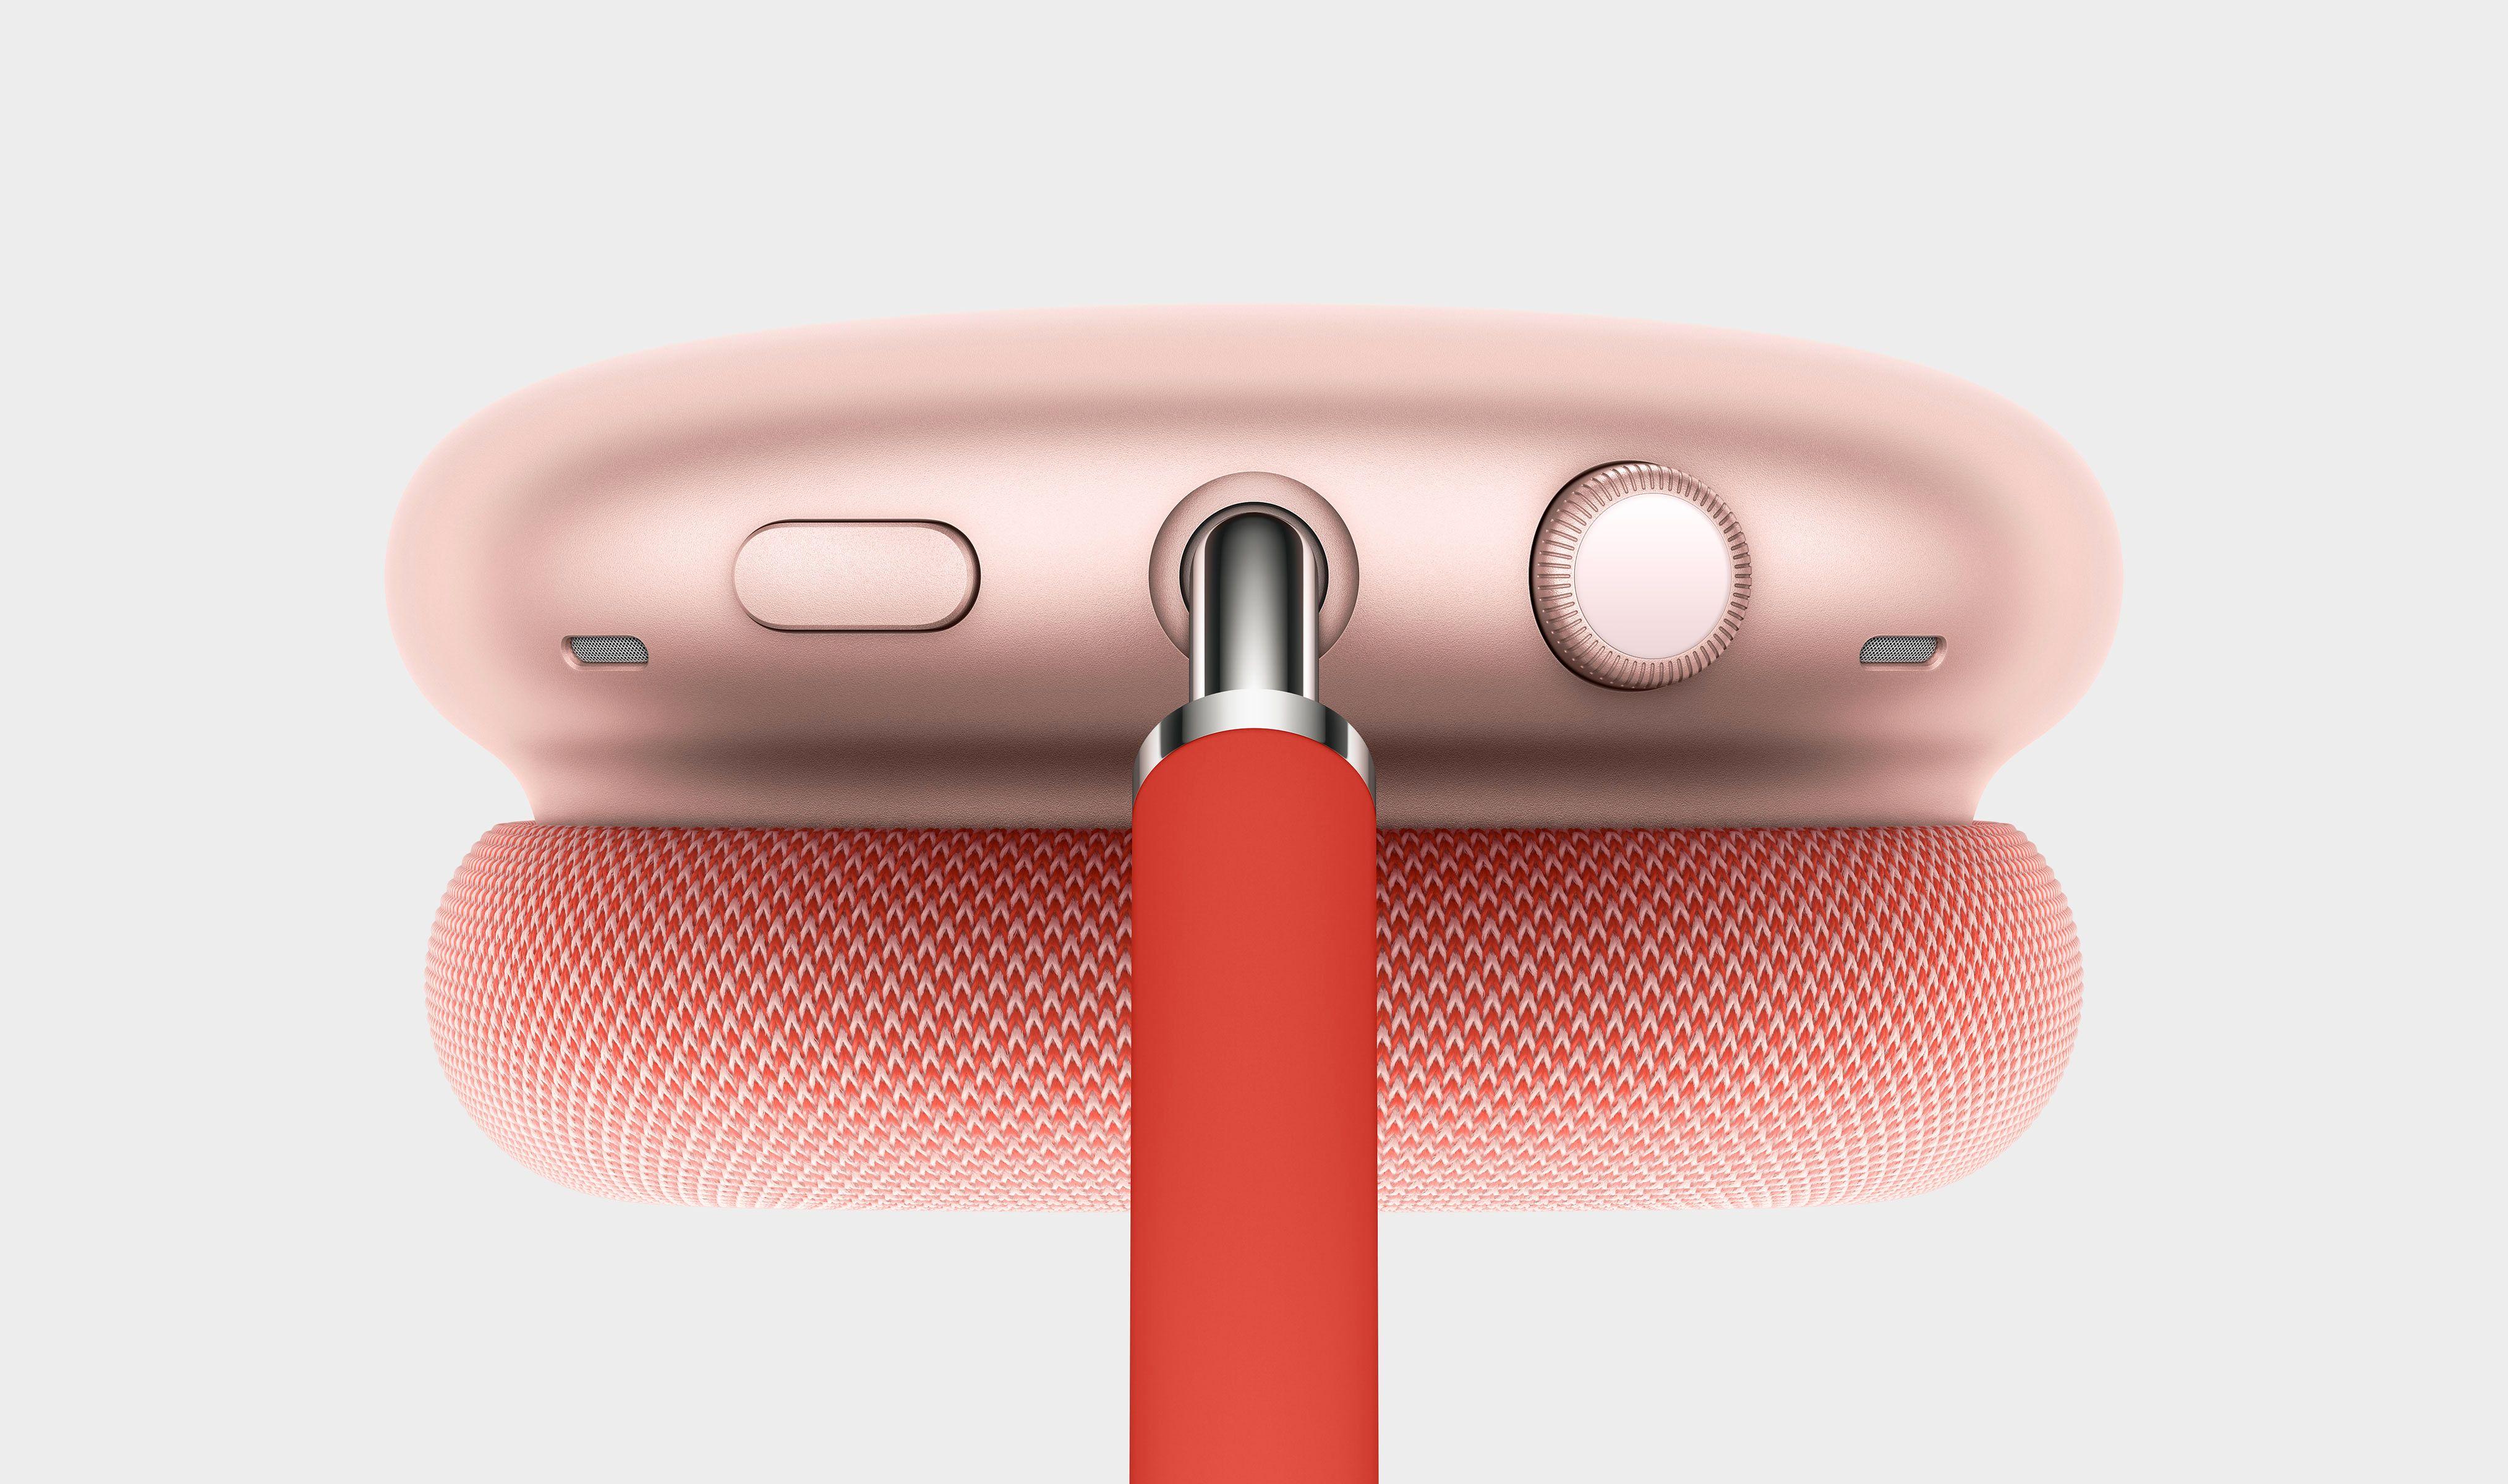 AirPods Max - Corona Digitale per Play/Pause